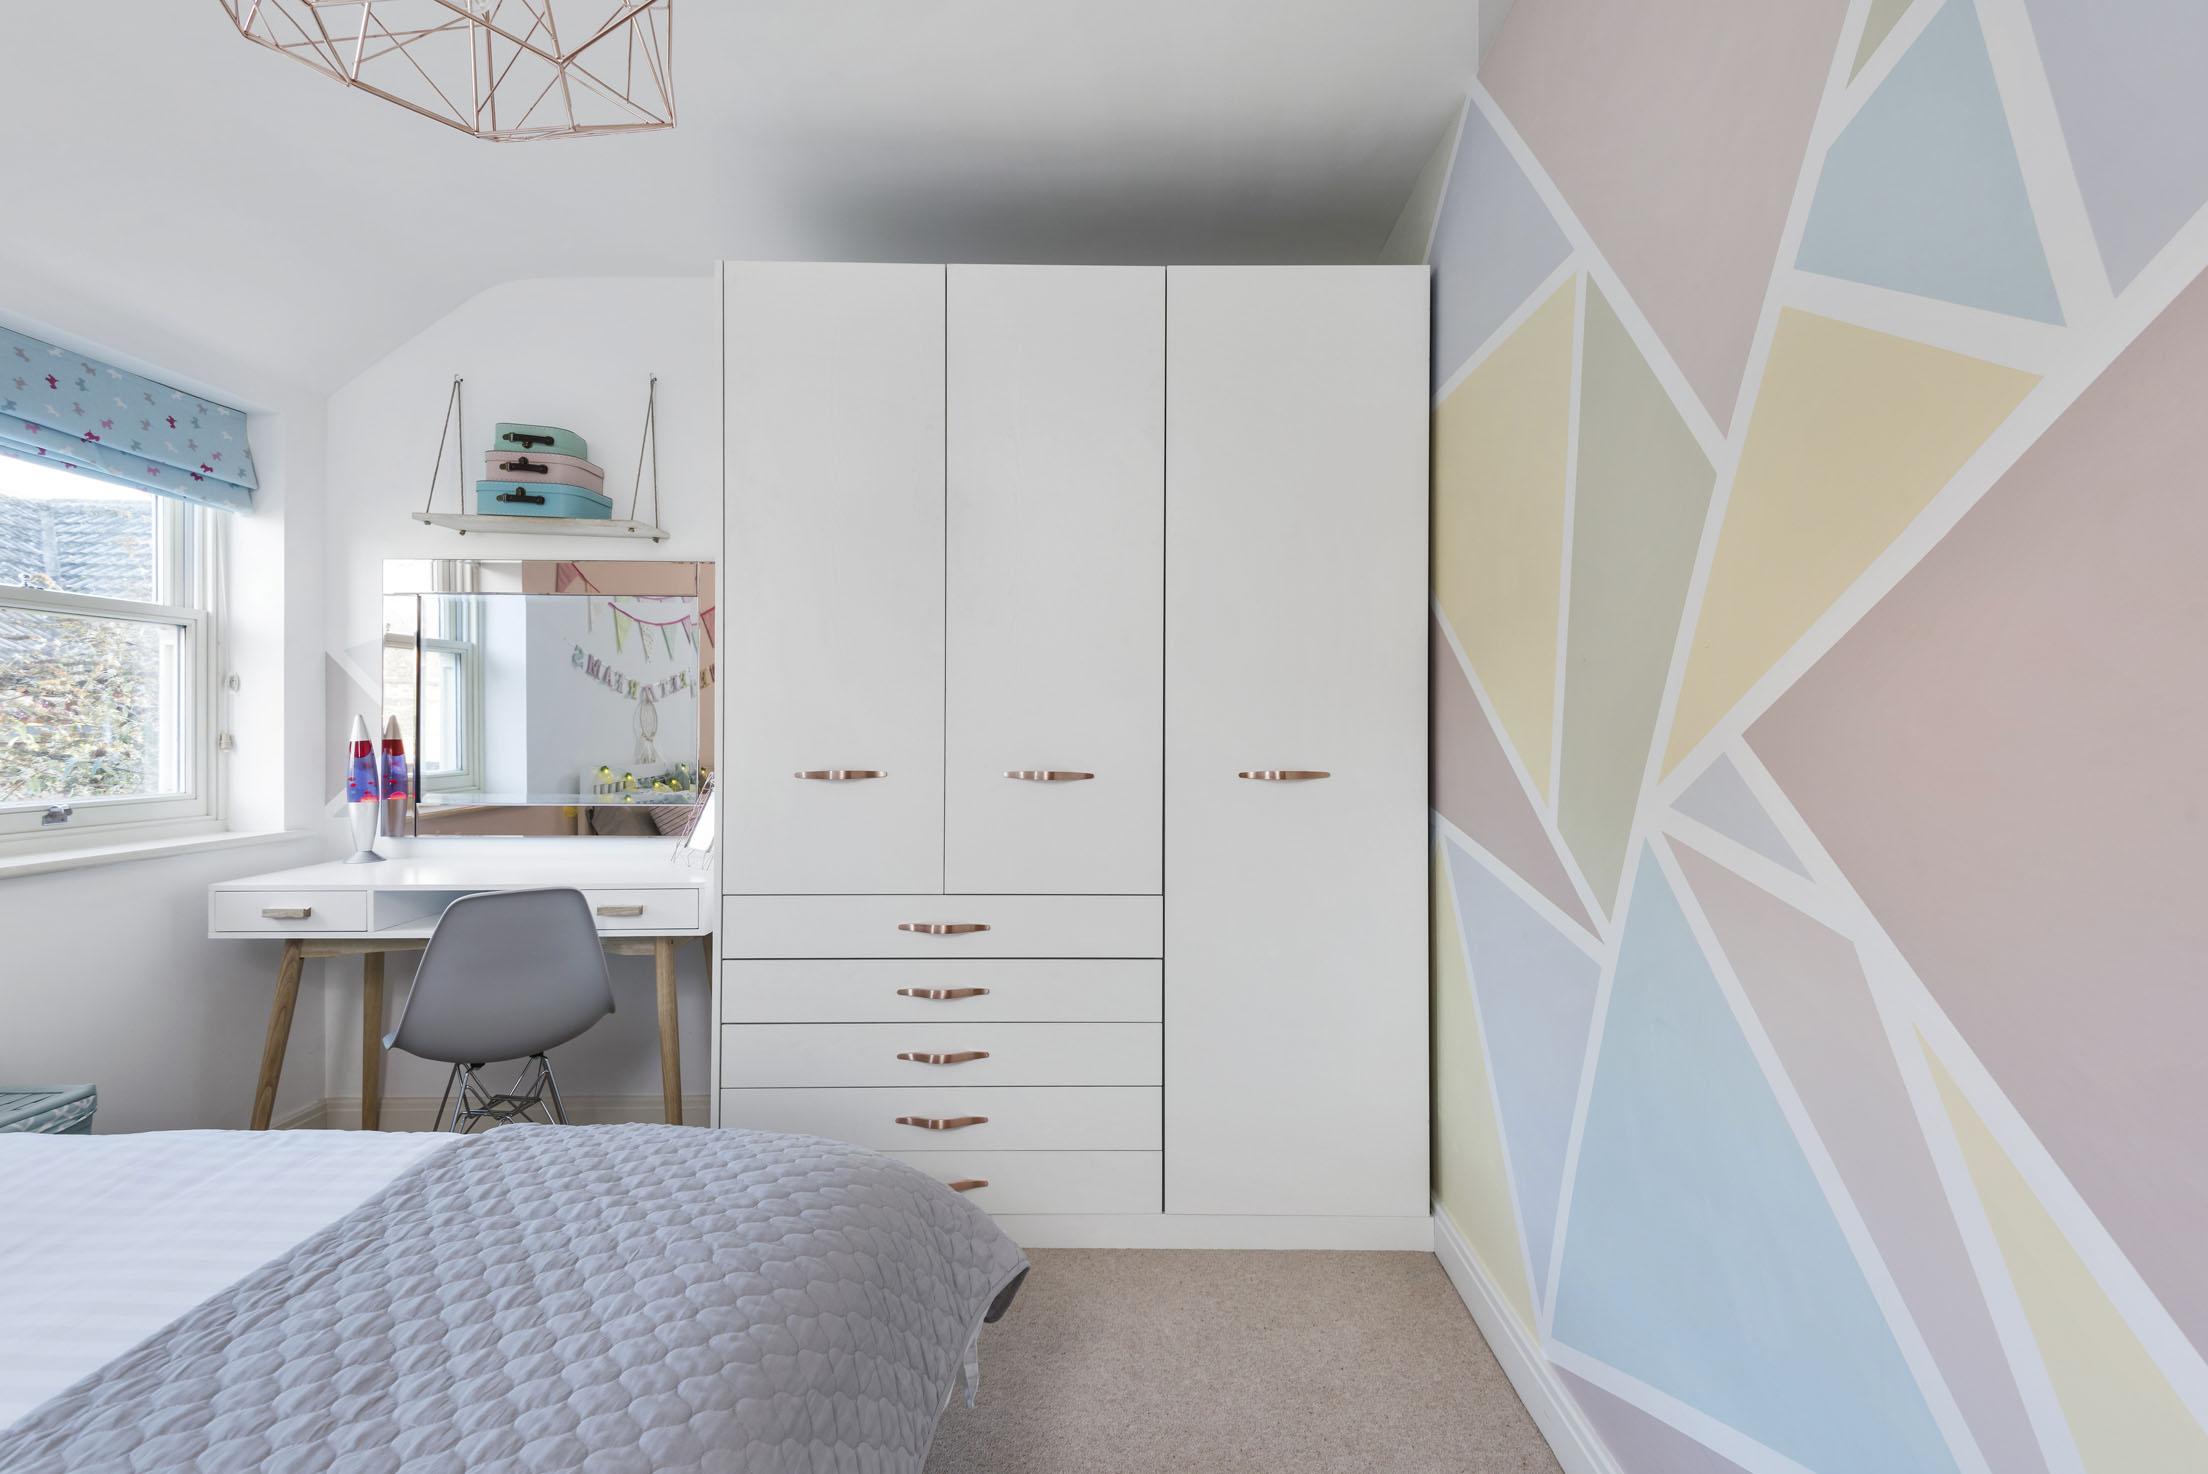 Sycamore Bedrooms